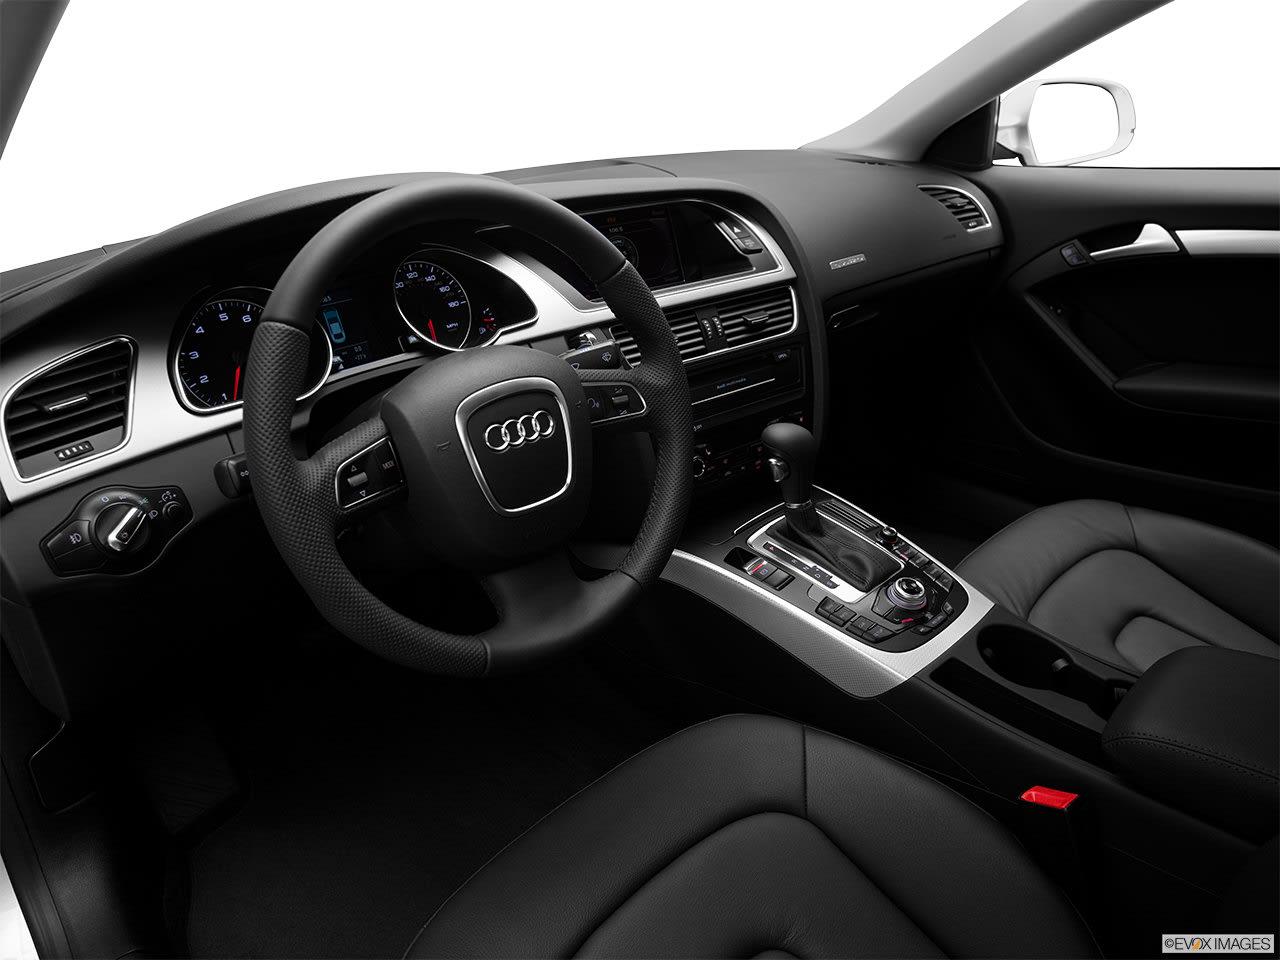 Audi A5 2012 interior